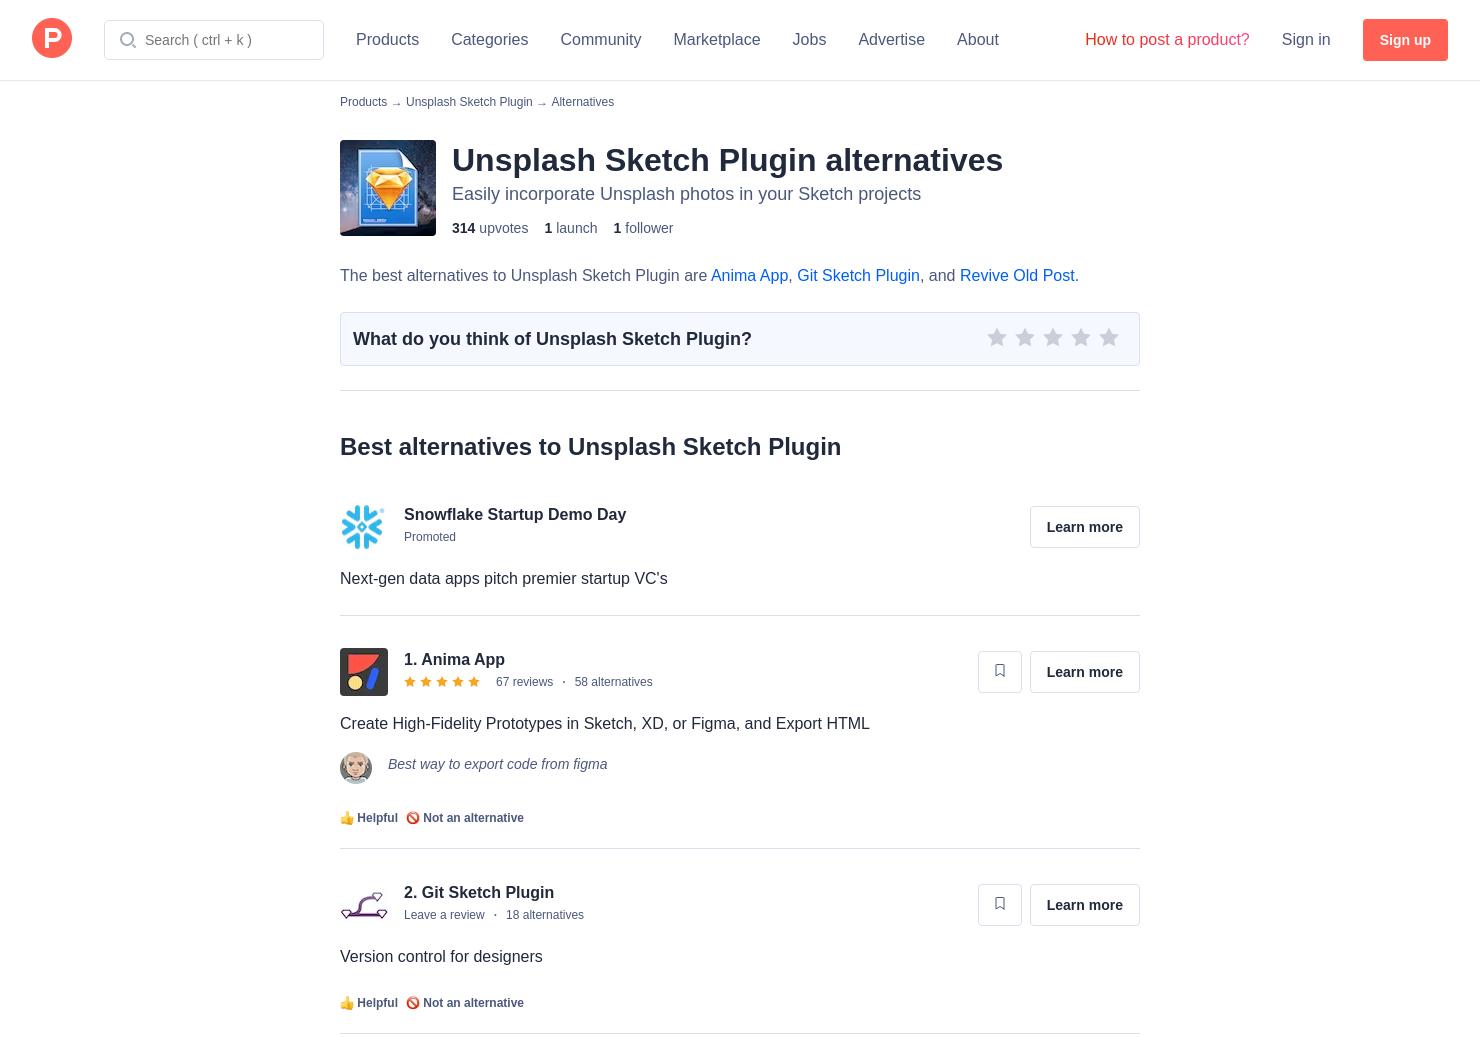 4 Alternatives to Unsplash Sketch Plugin for Mac | Product Hunt